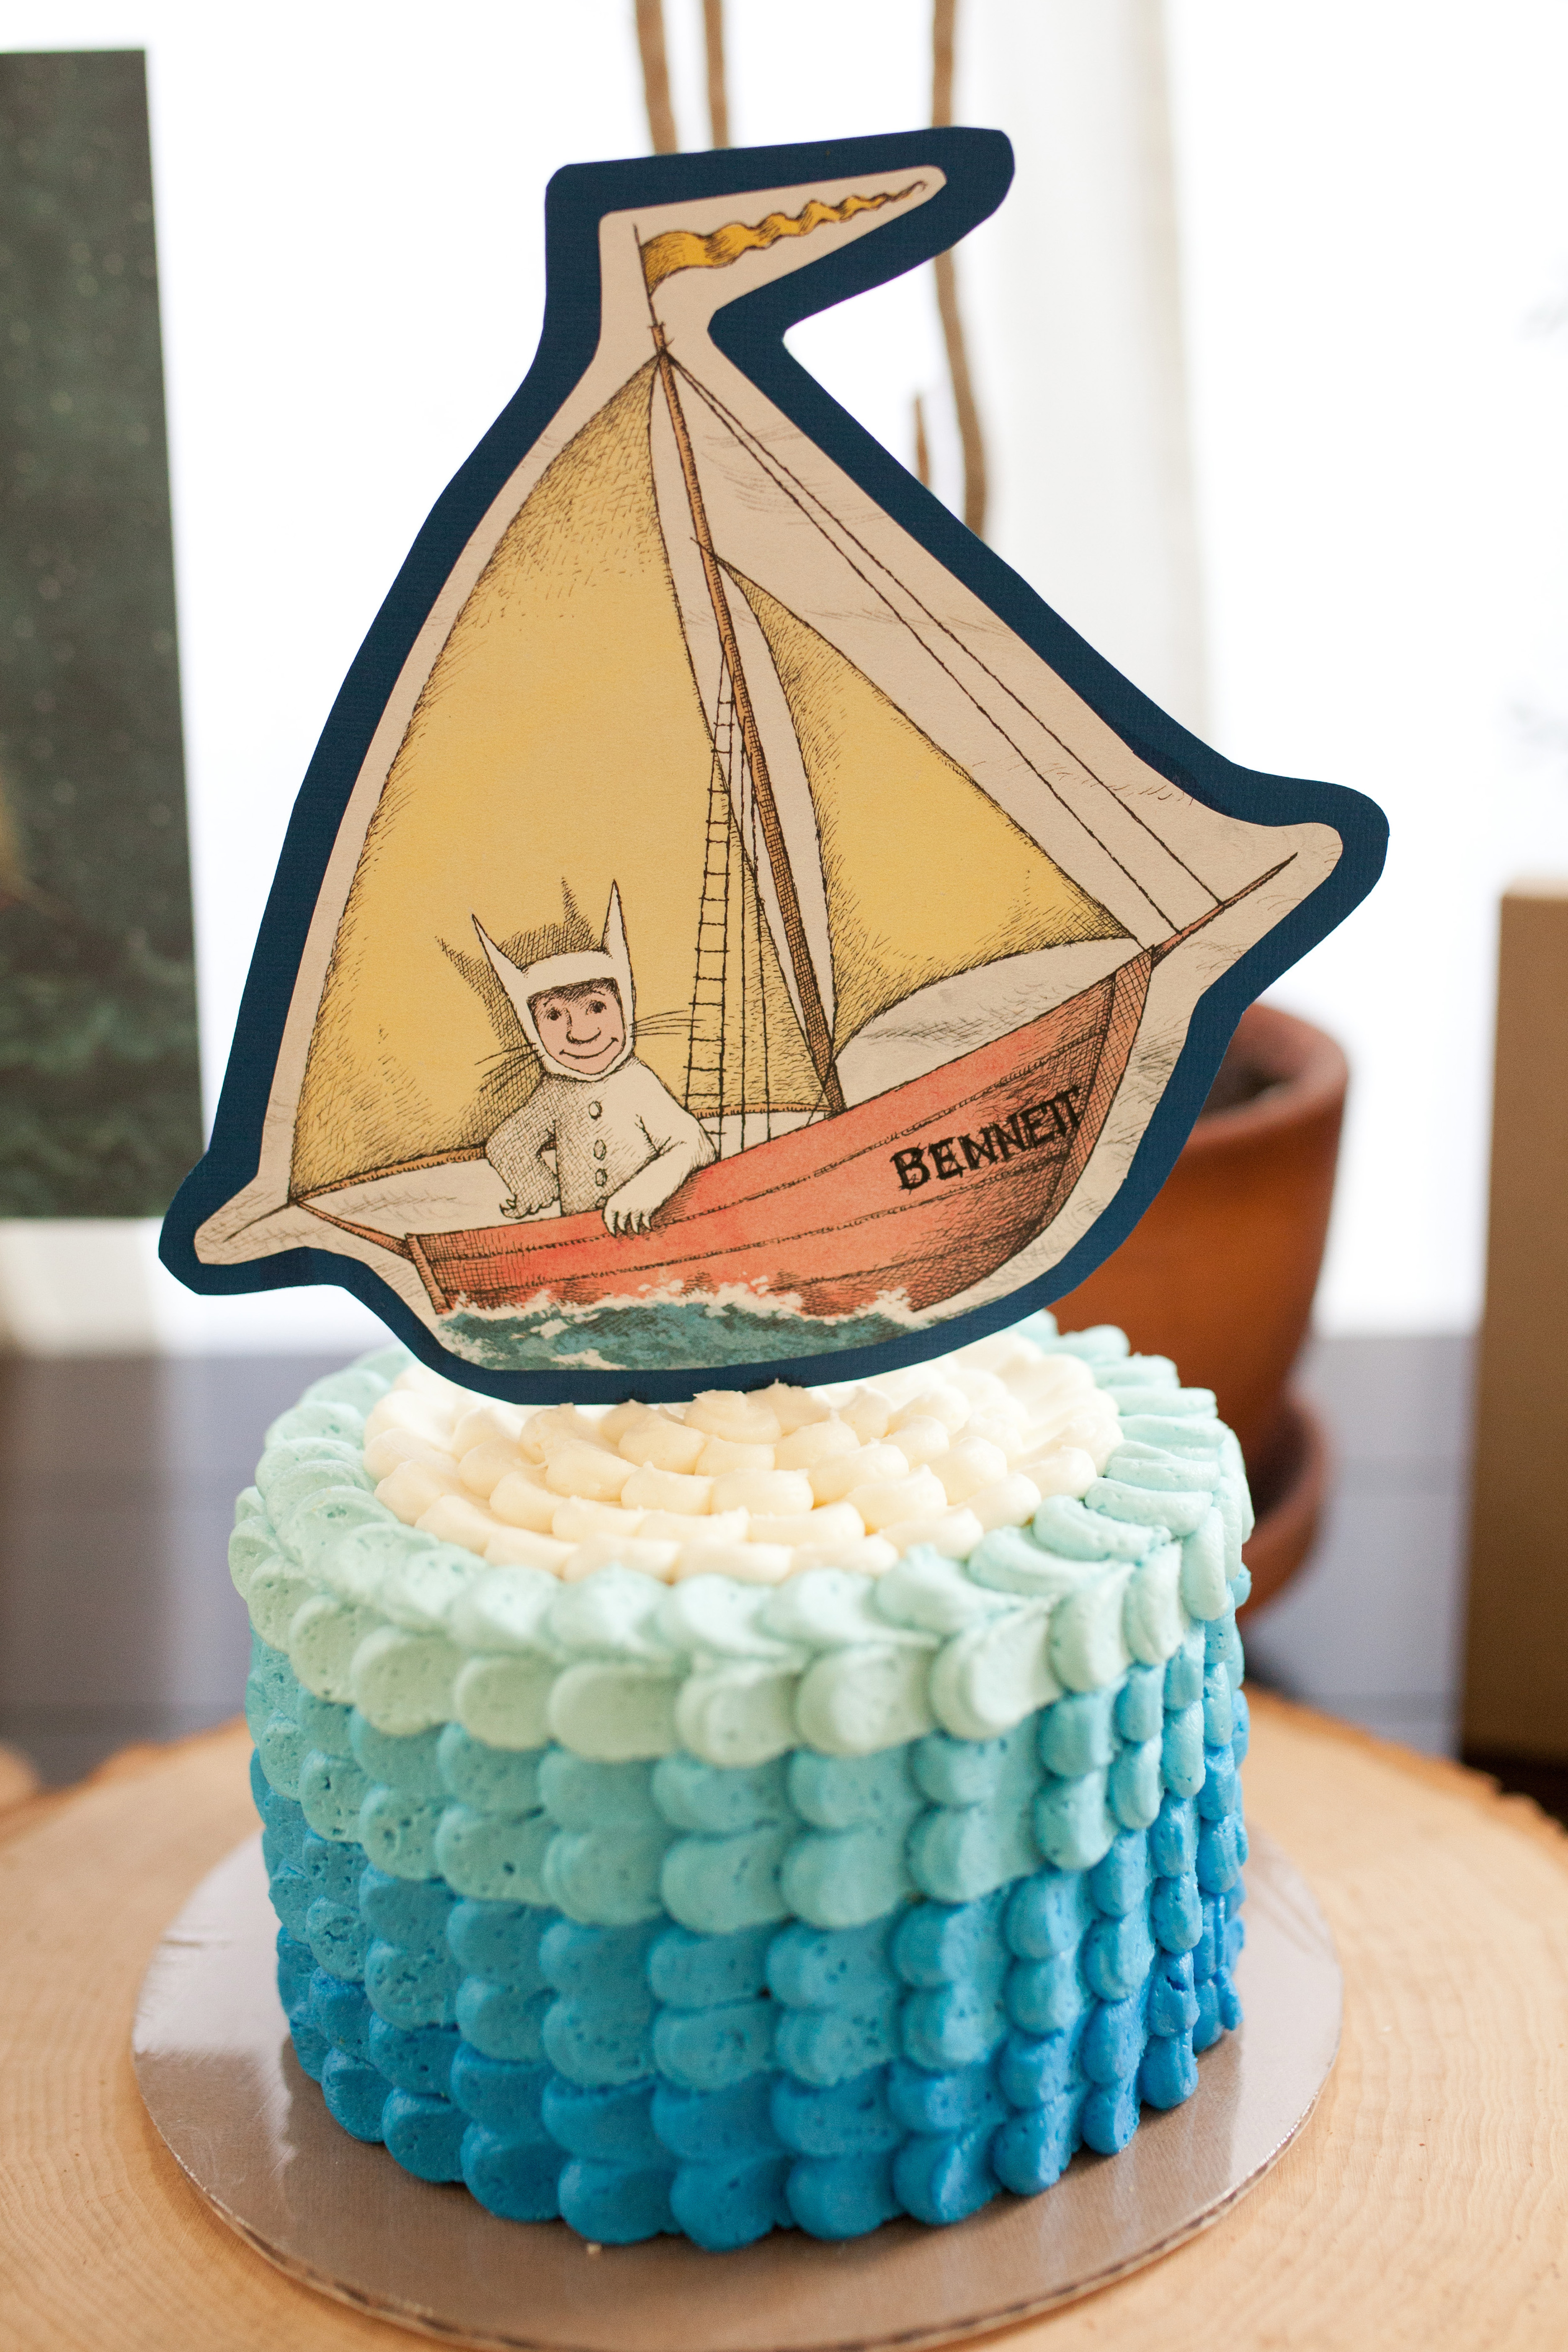 Heartstrings Baking Company Custom Cakes Cupcakes And Baked Goods